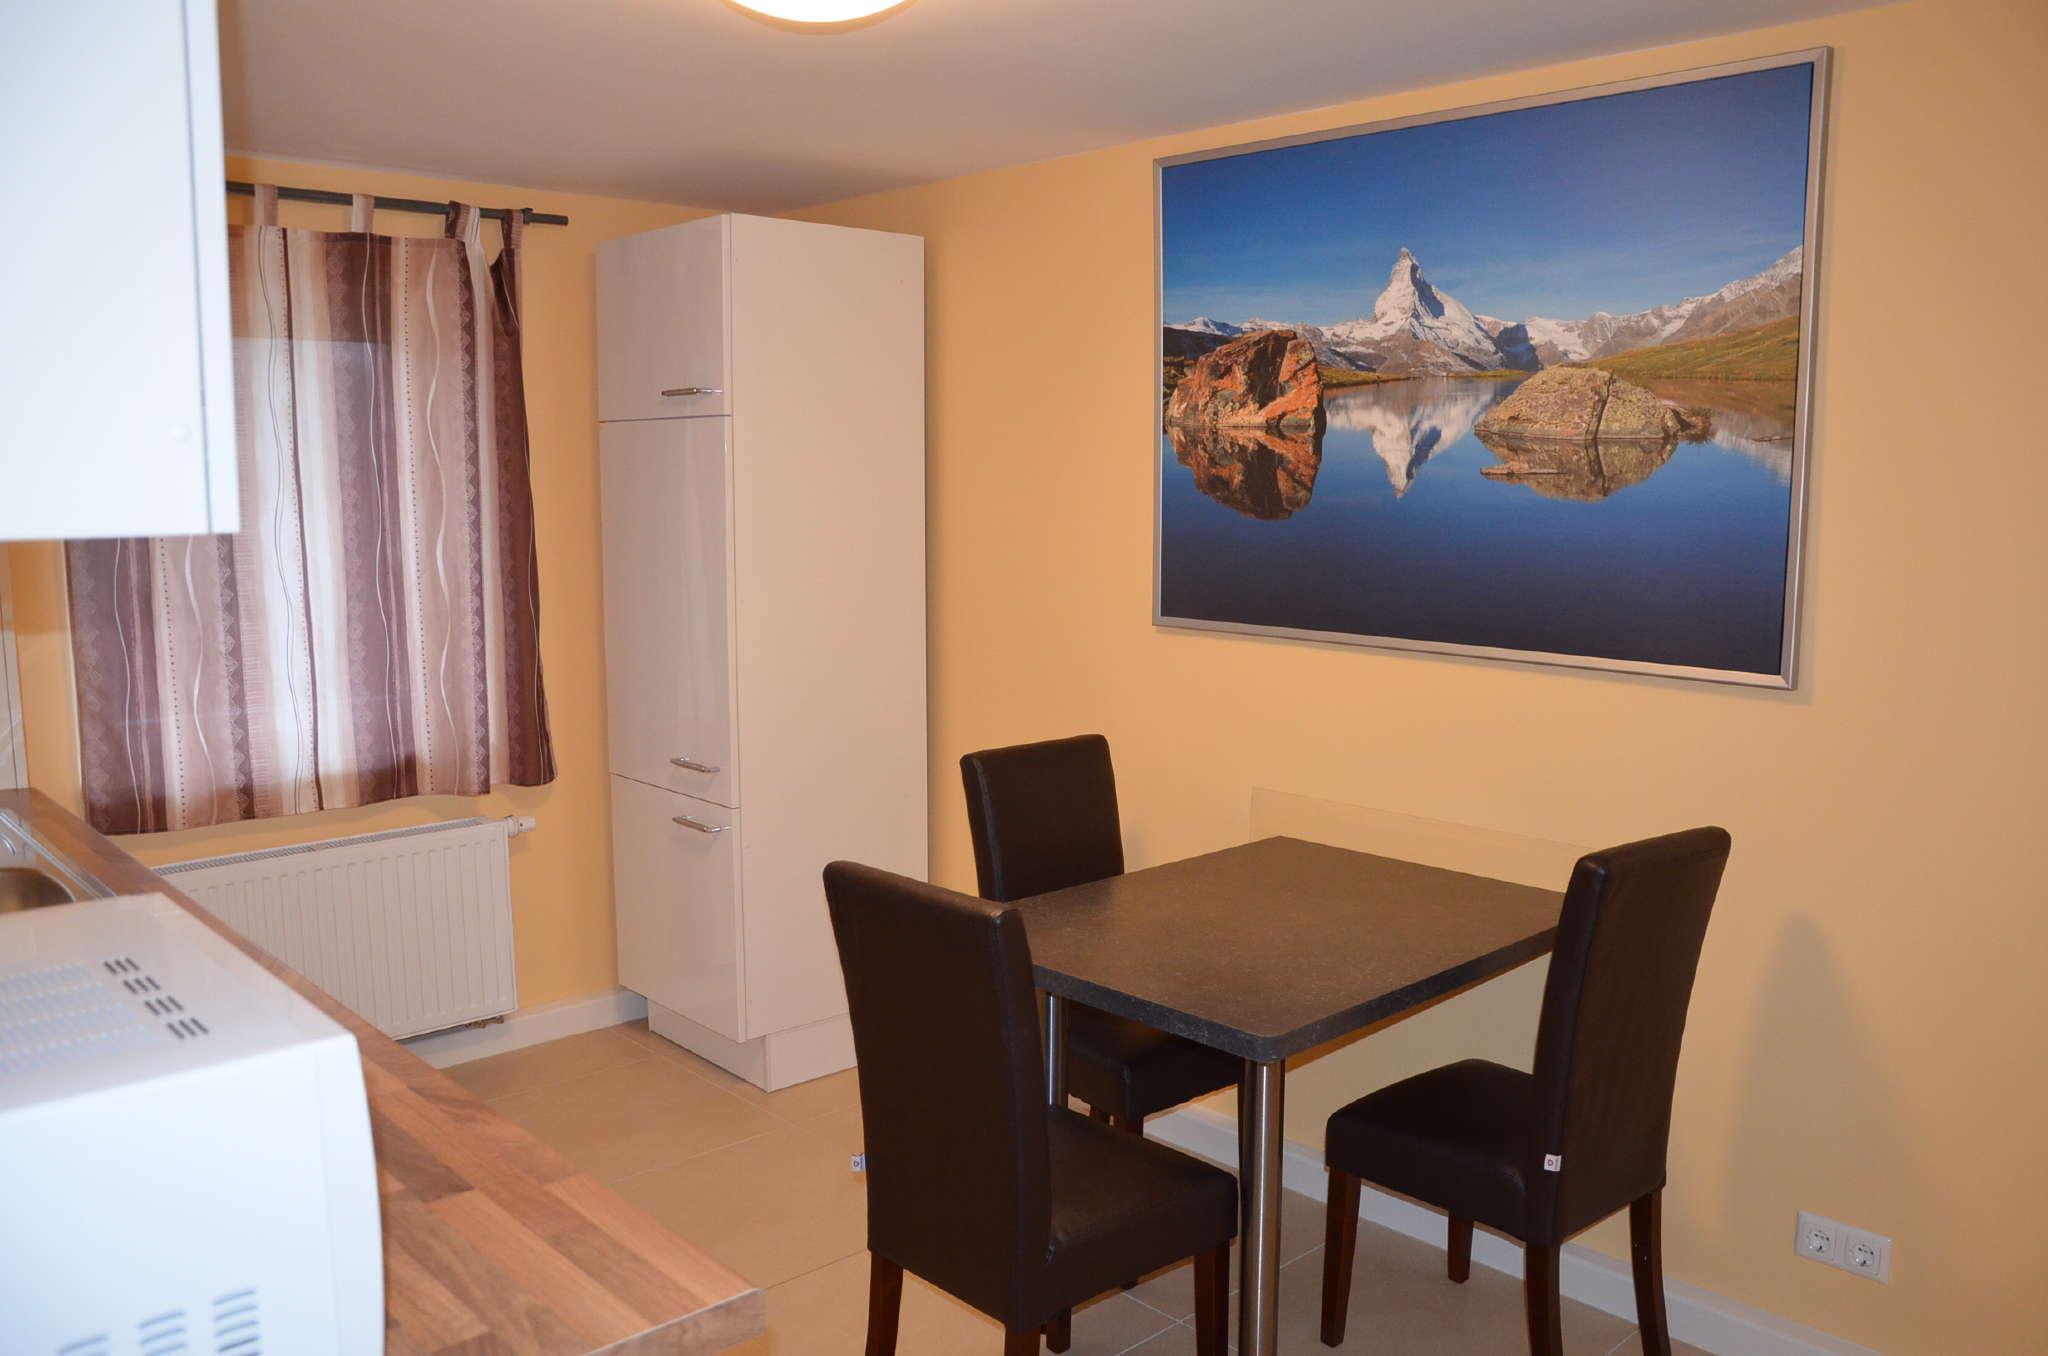 roomsearch24 ferienwohnung leipzig gohlis 24686. Black Bedroom Furniture Sets. Home Design Ideas